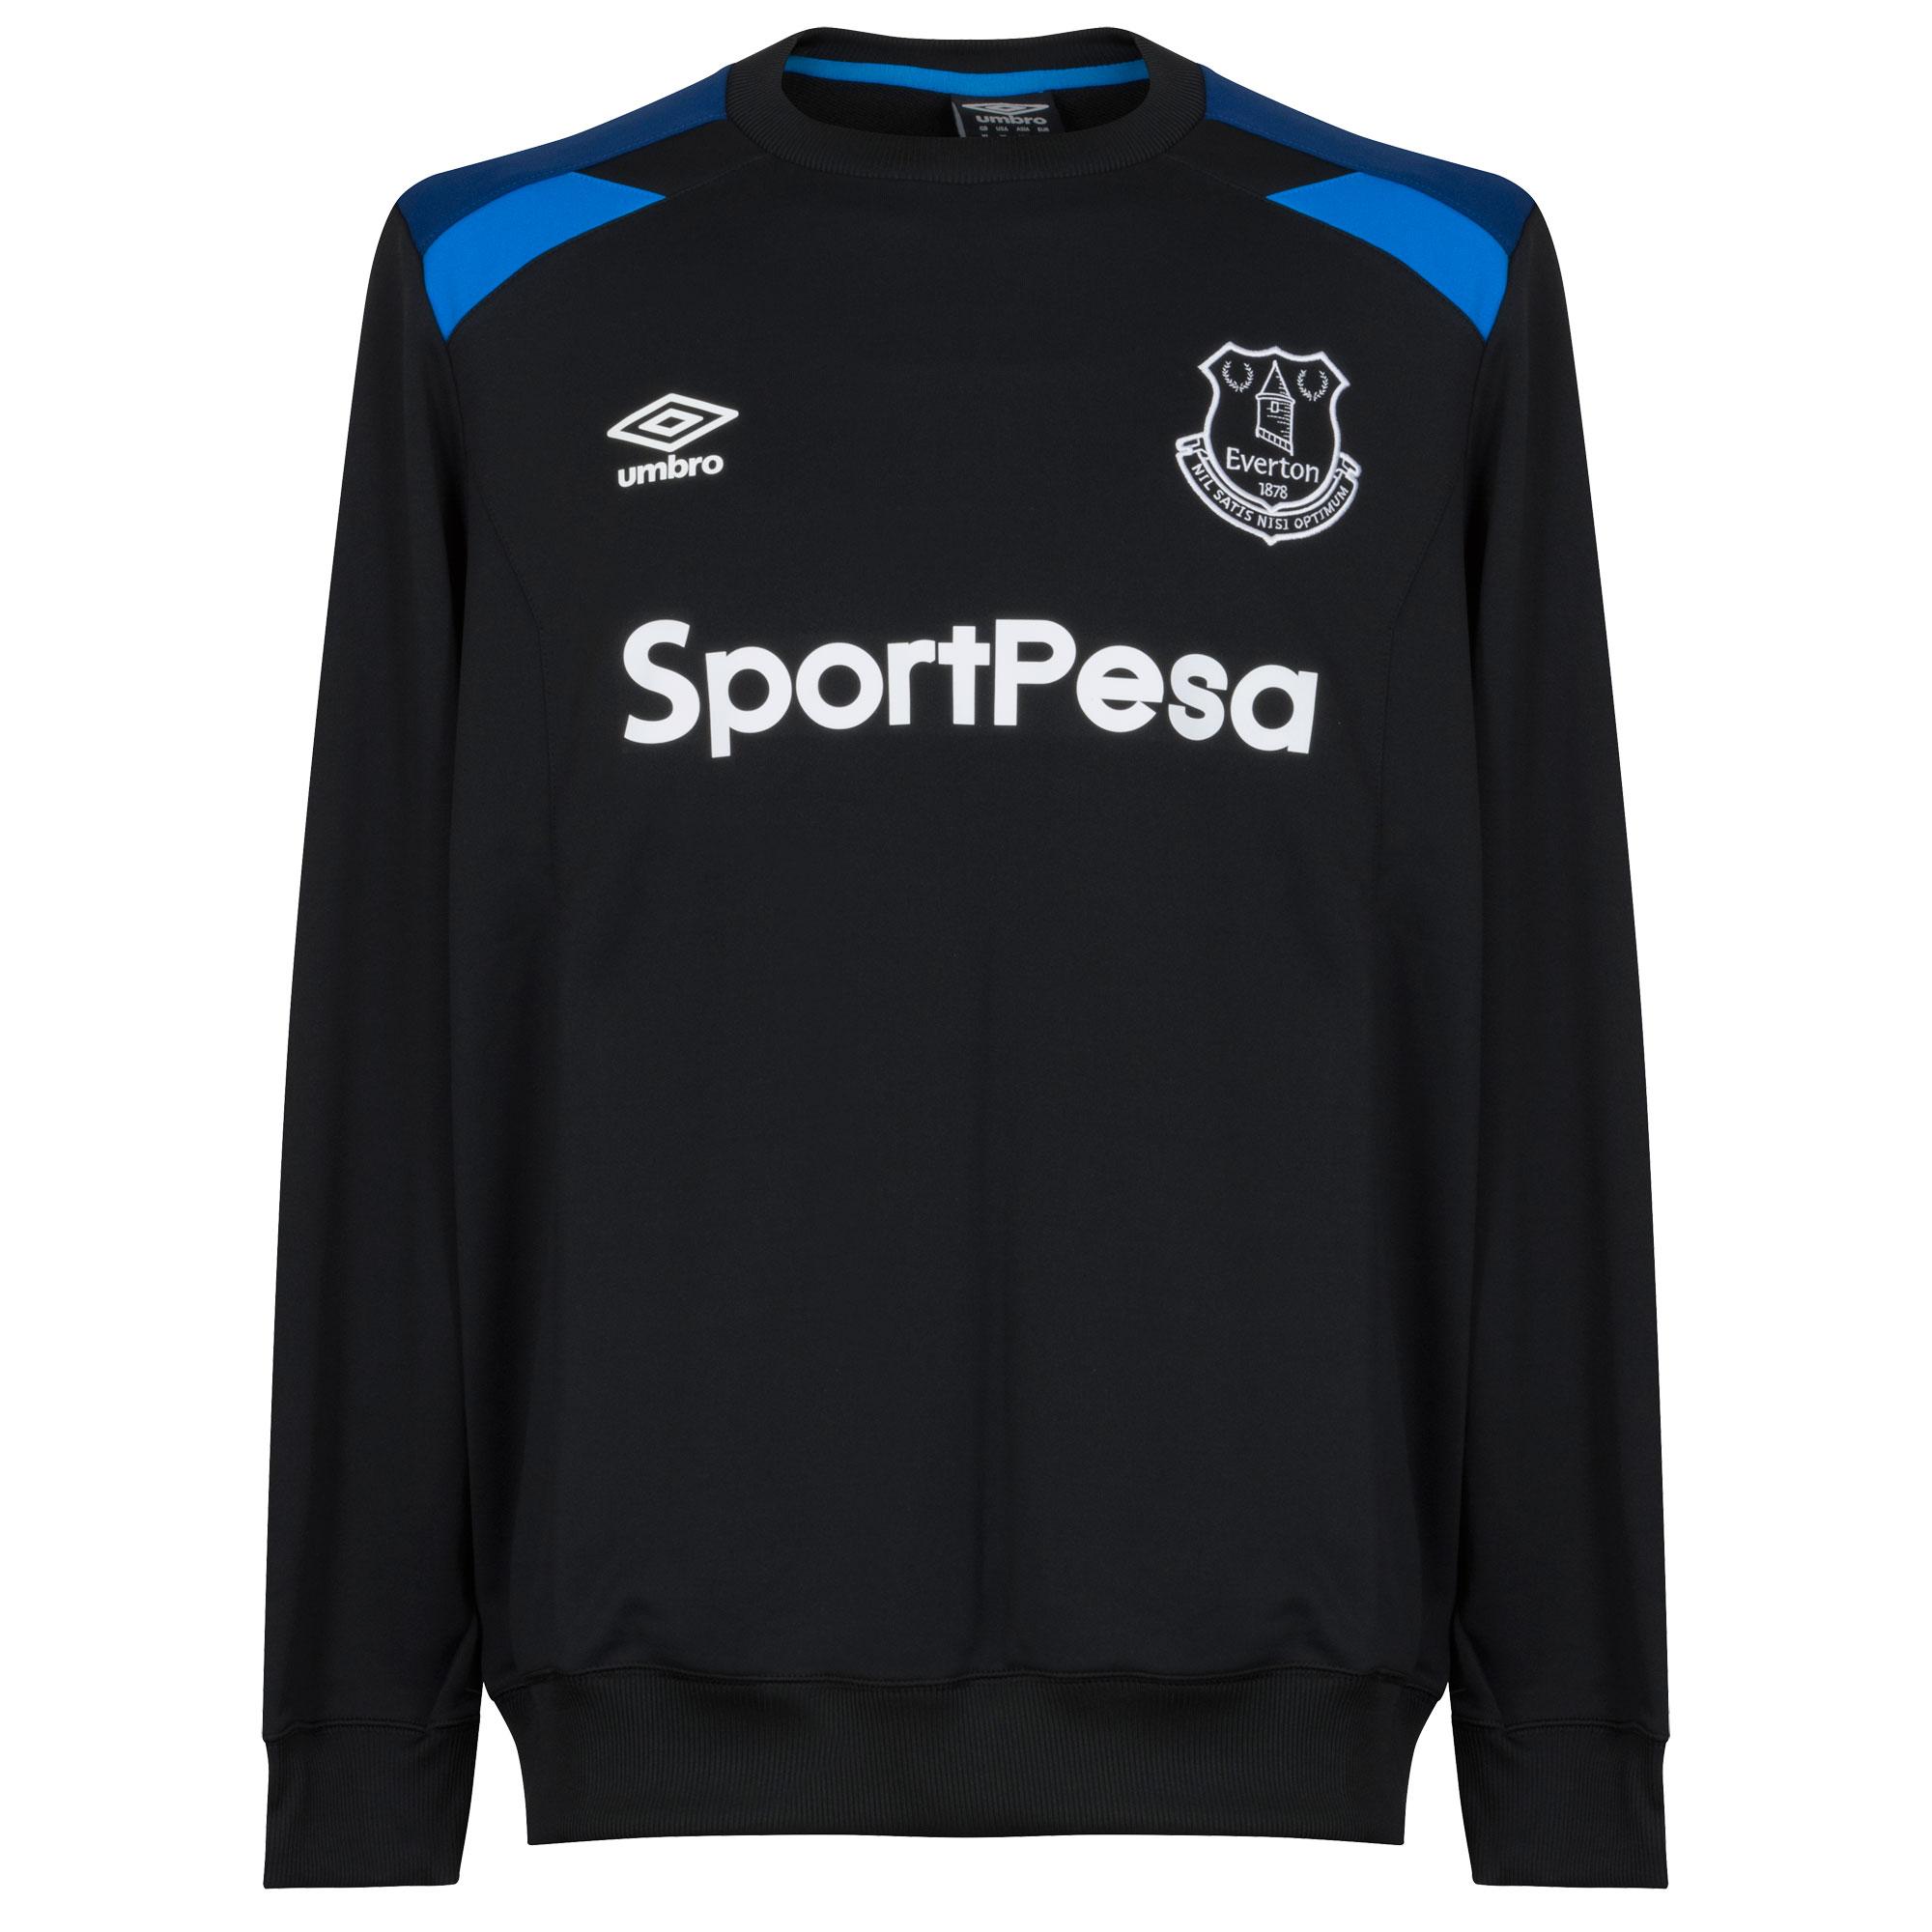 Everton Training Top 2017 / 2018 - Black - S